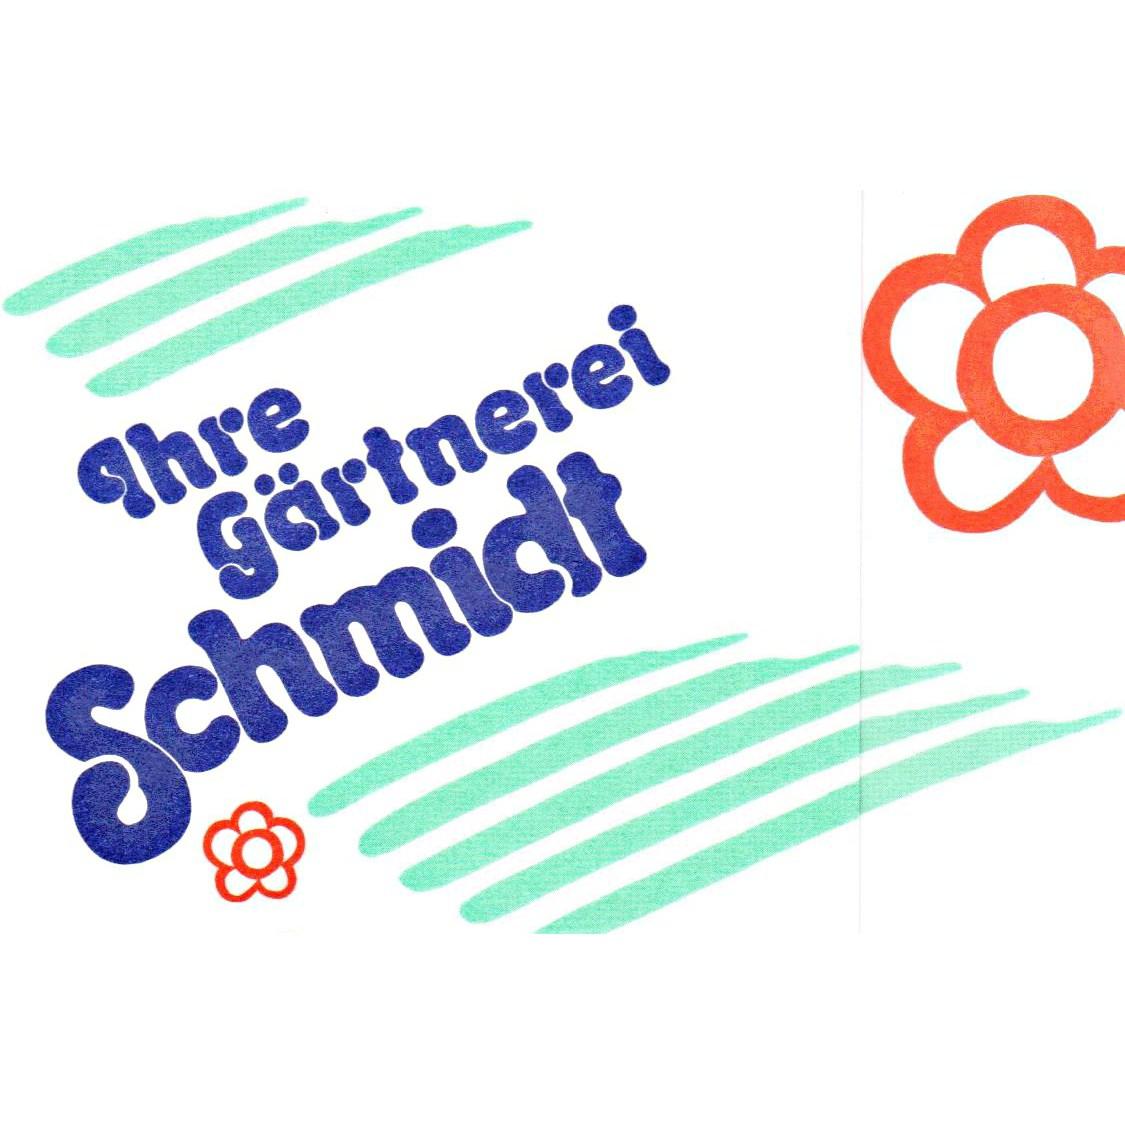 Gärtnerei Schmidt